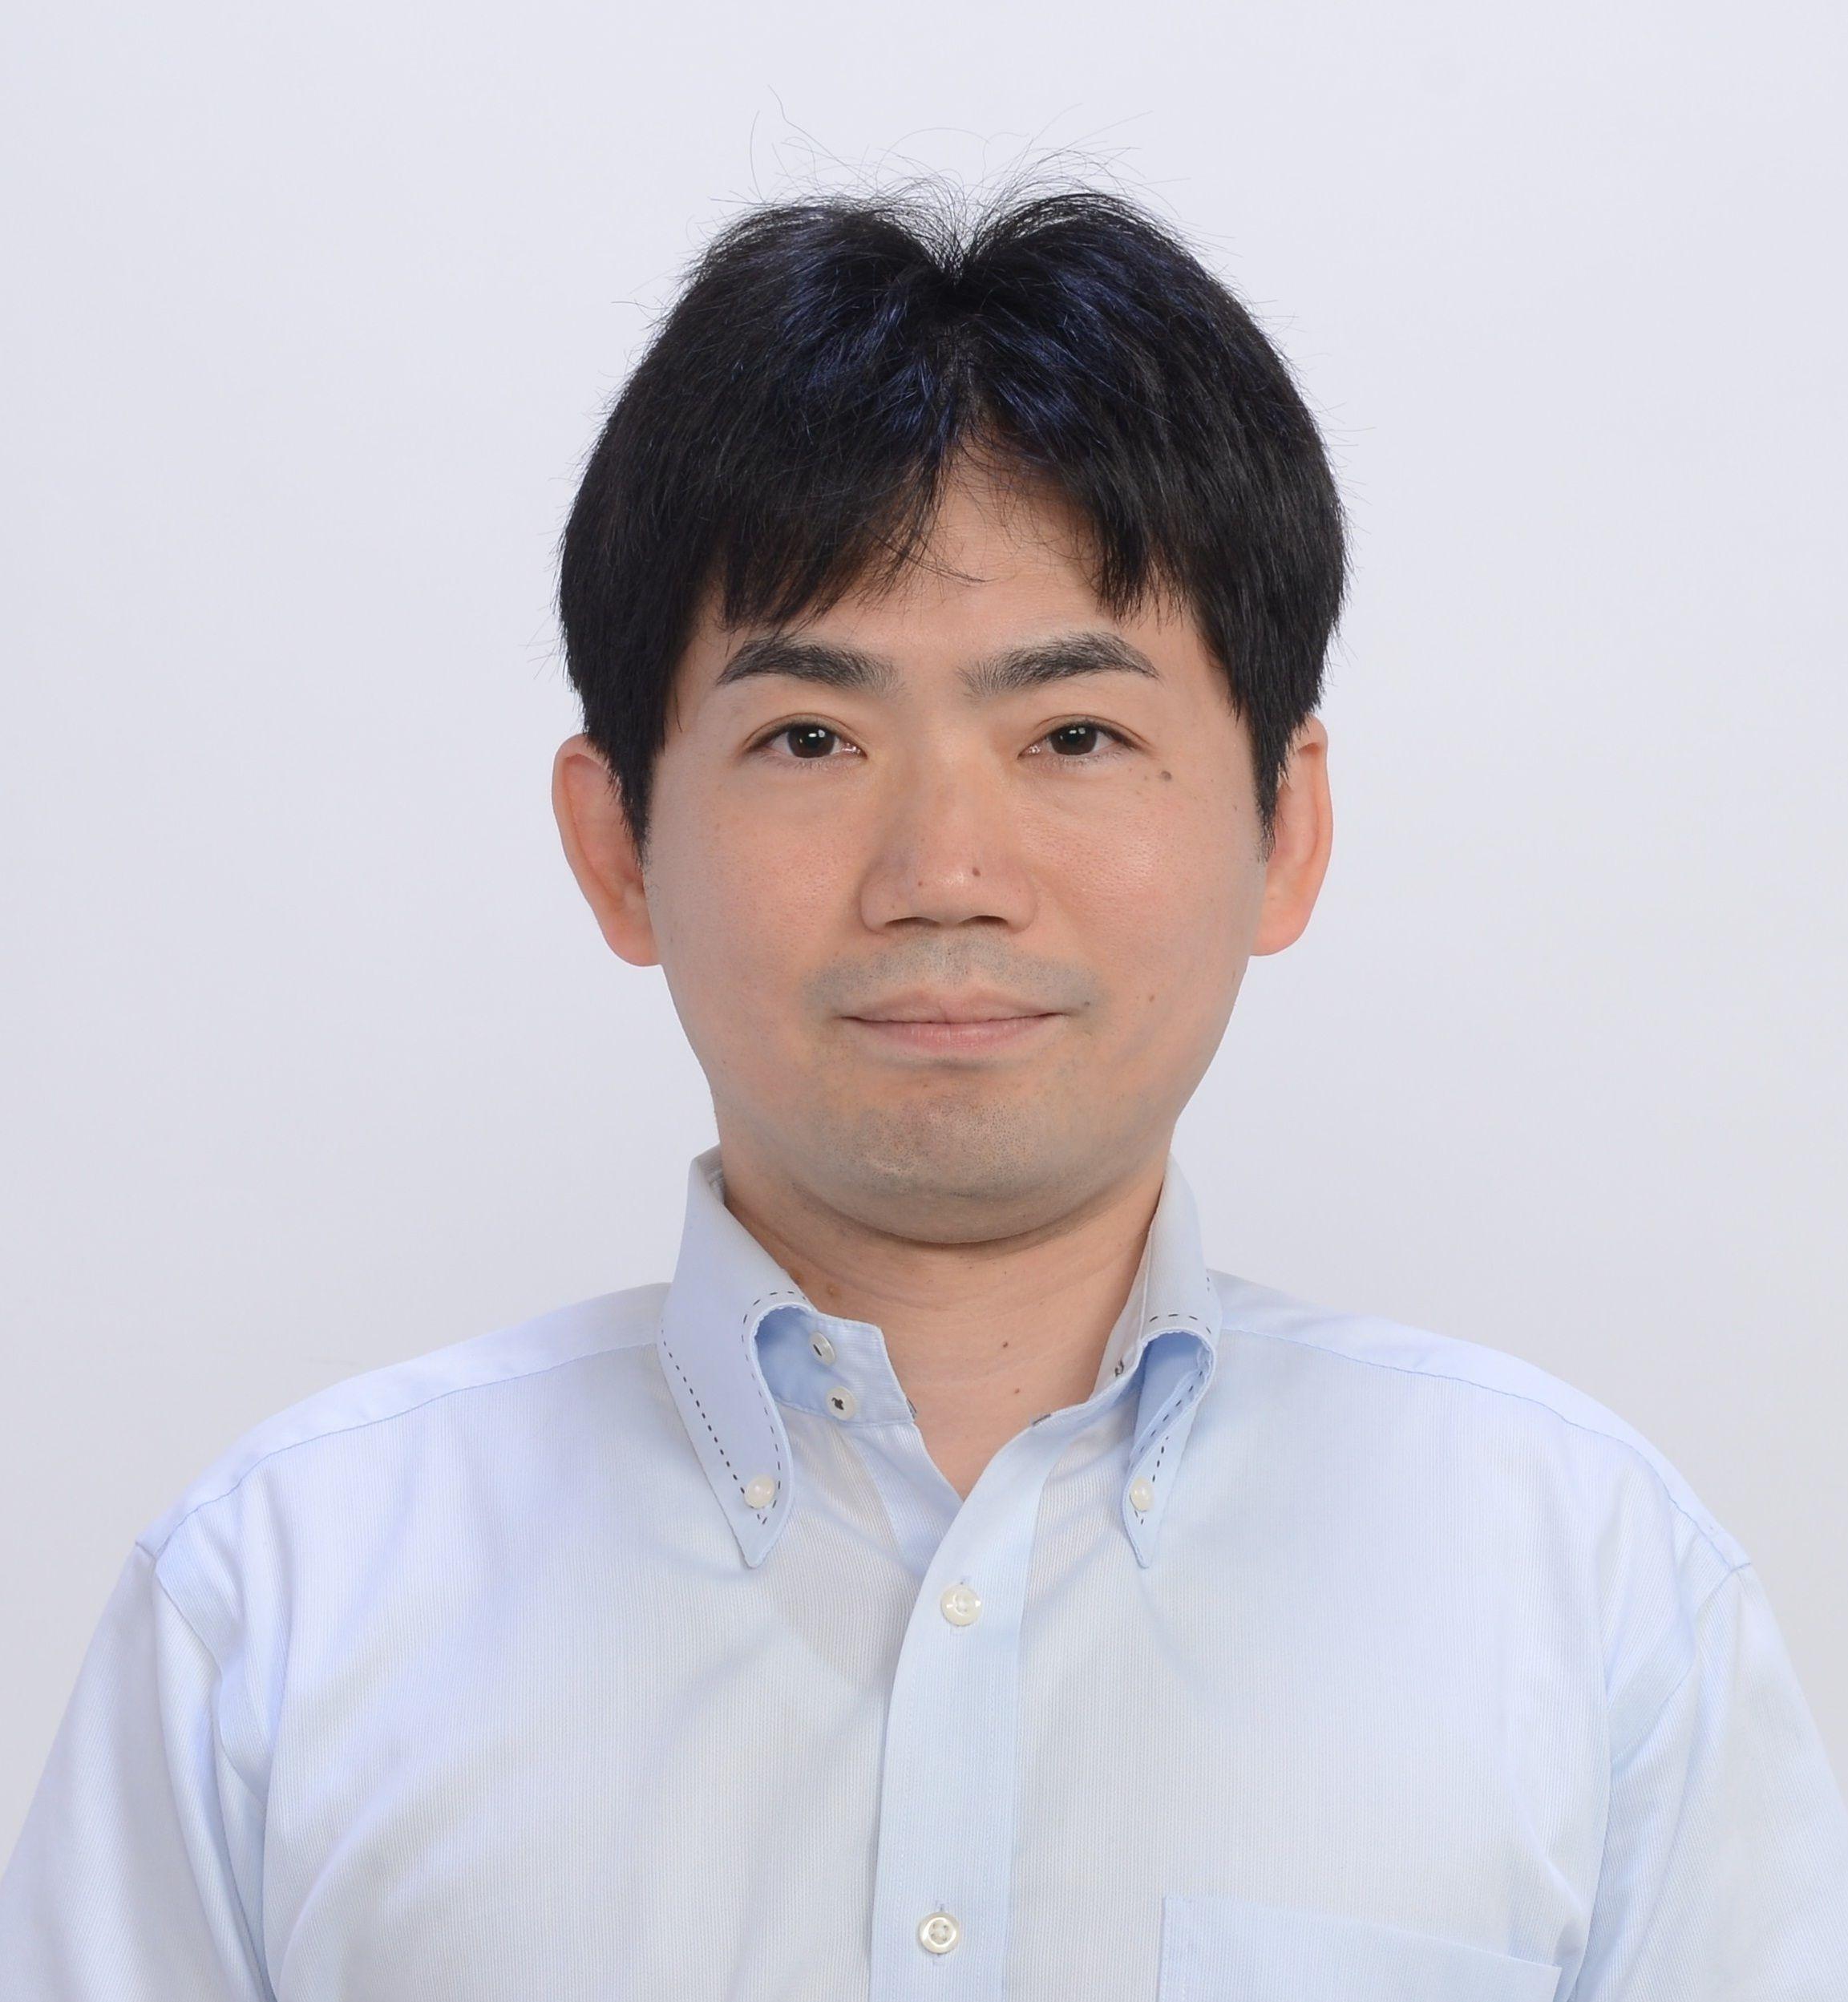 https://www.nitech.ac.jp/eng/mt_imgs/hirata2.jpg